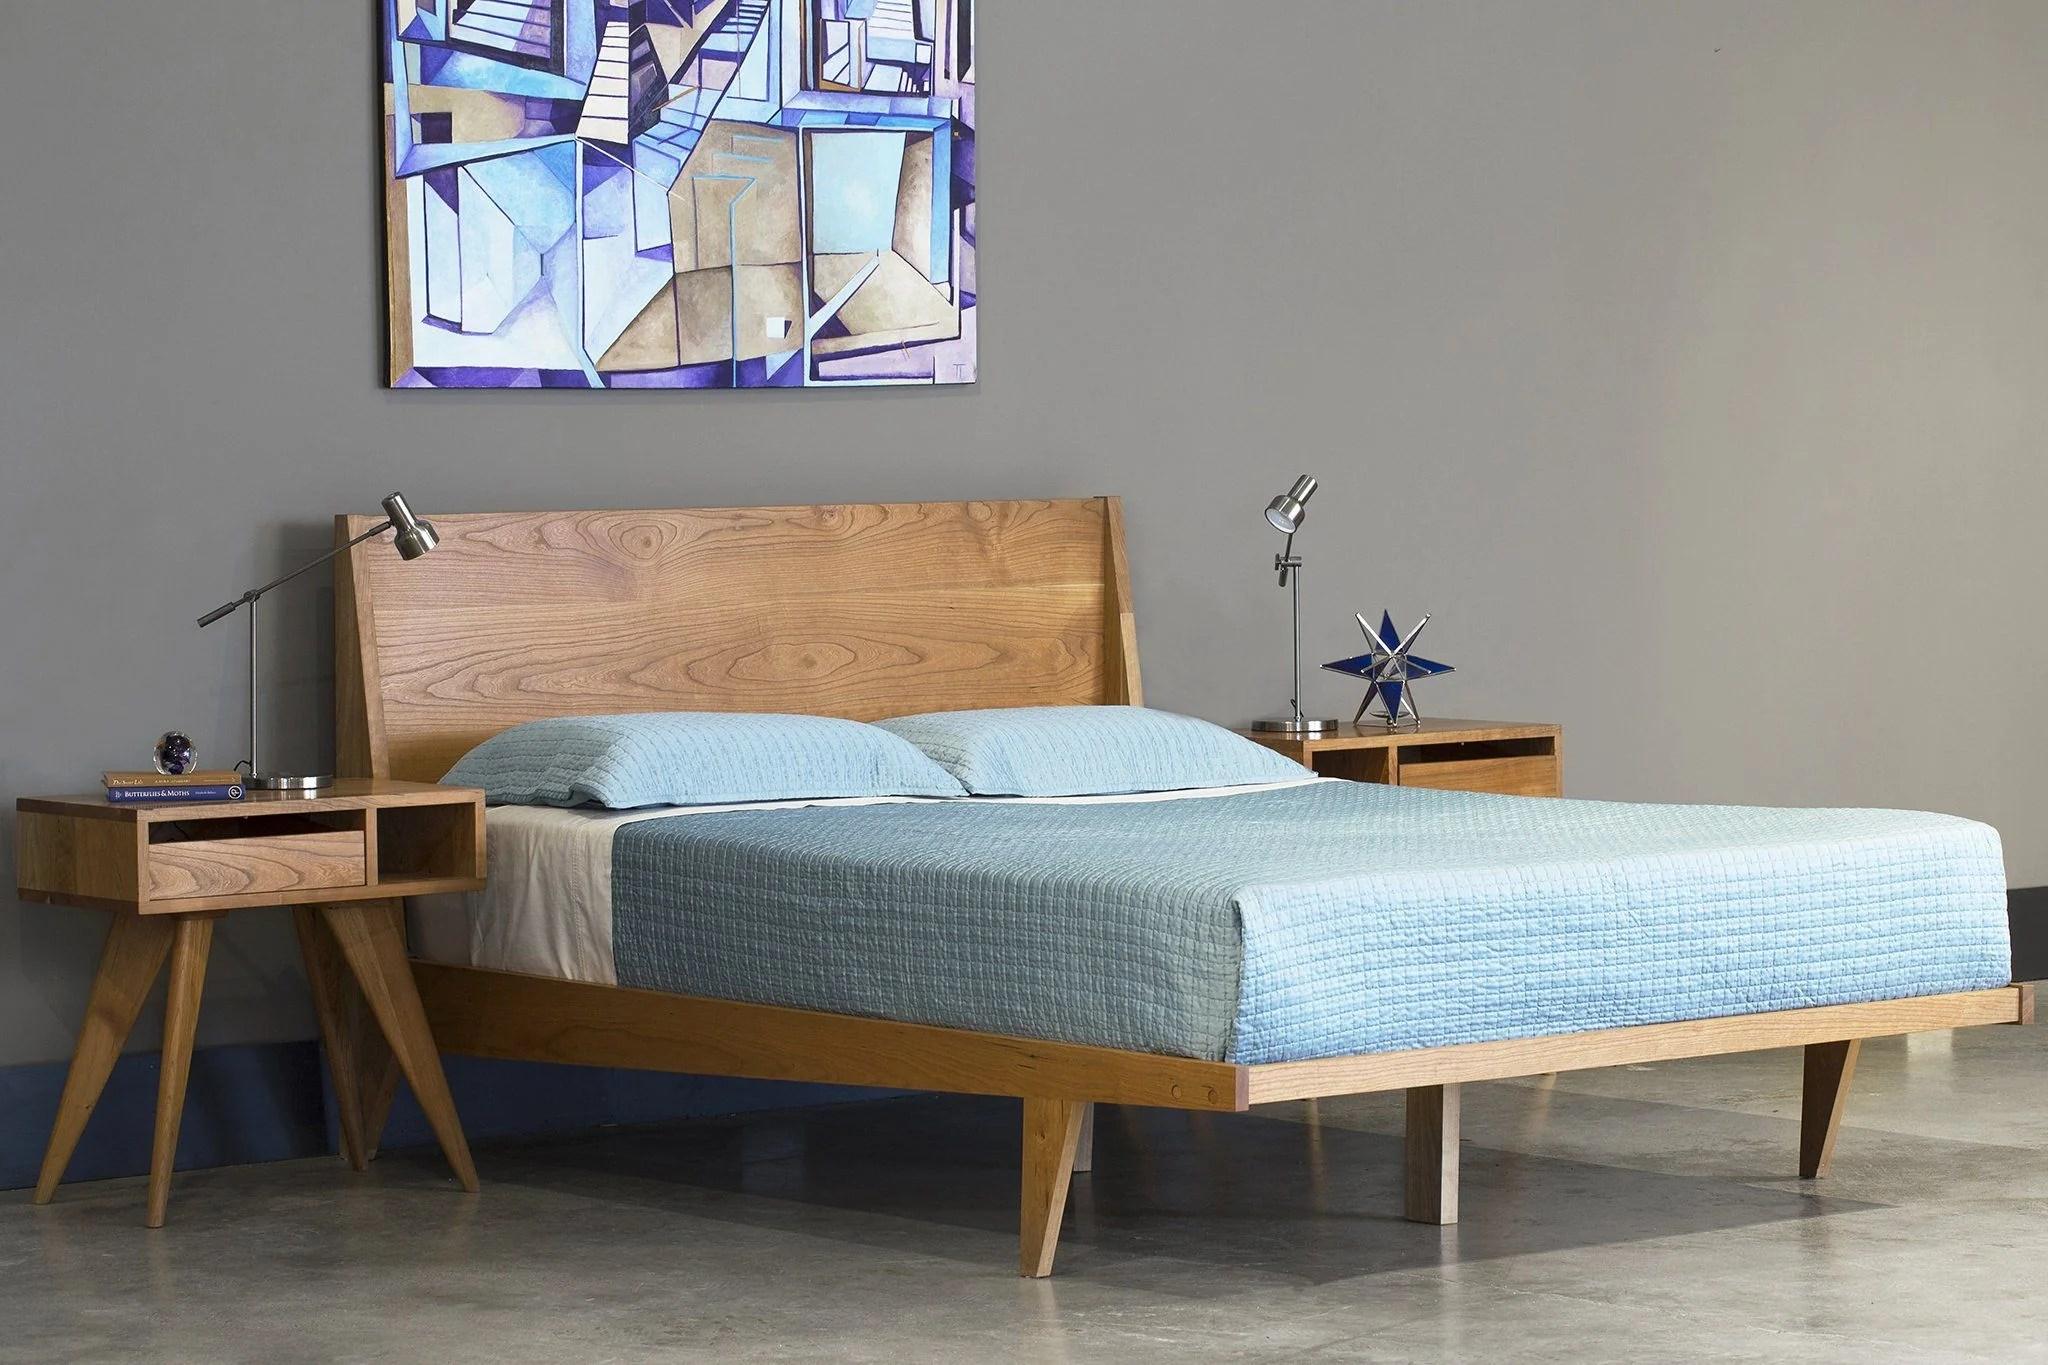 midcentury modern bed